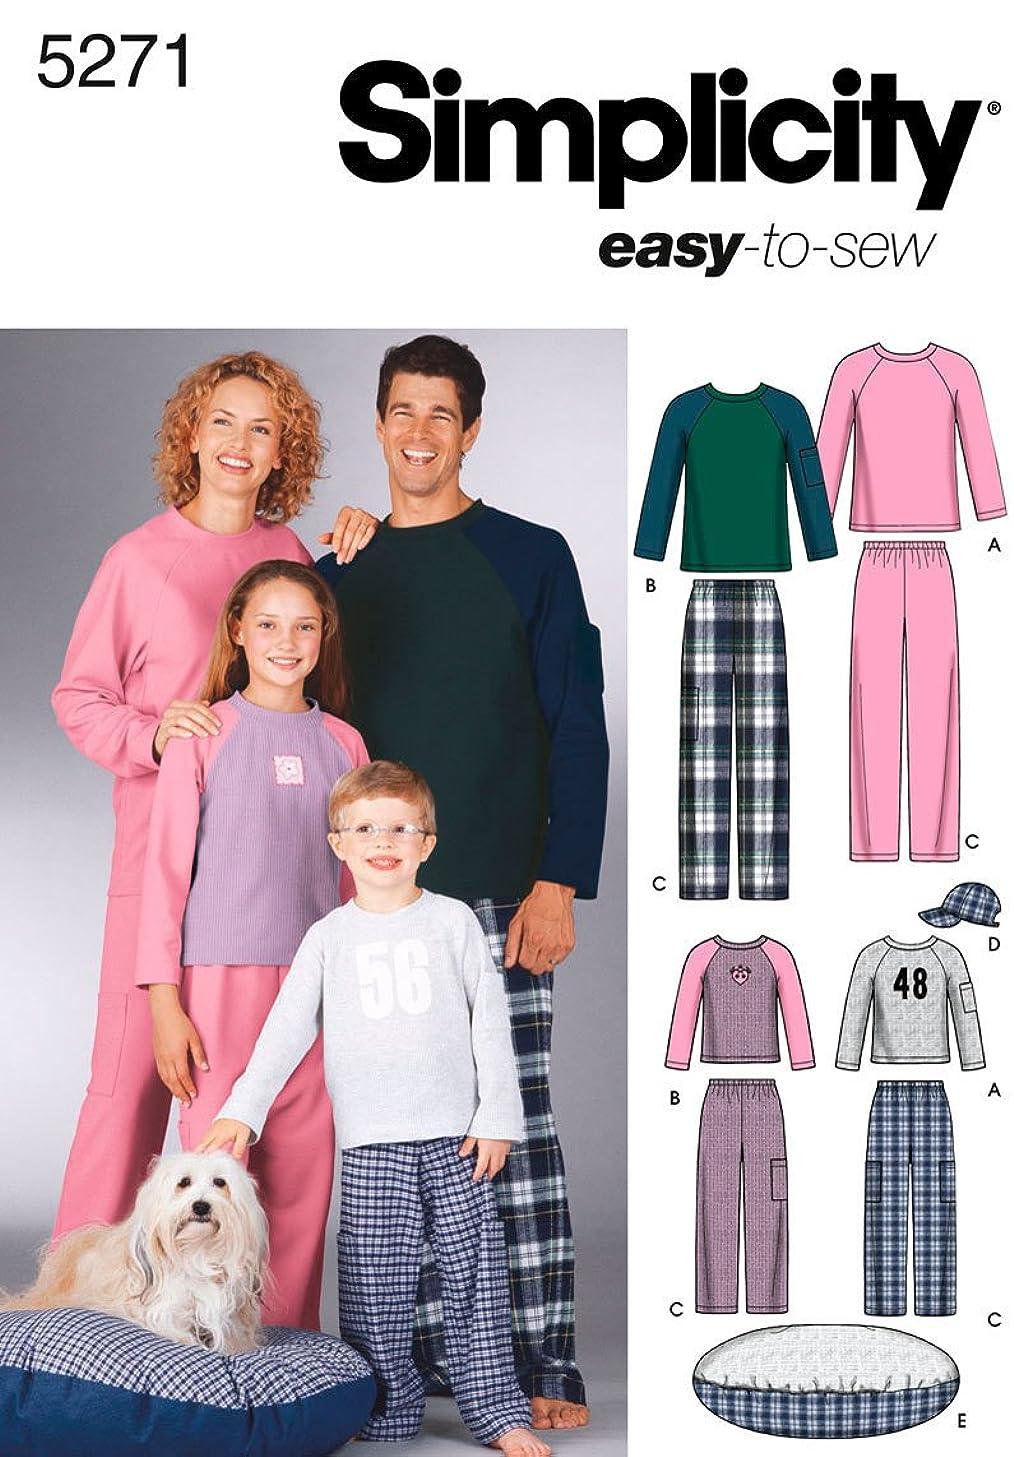 Simplicity Sewing Pattern 5271 Miss/Men/Child Sleepwear, A (XS-L/XS-XL)